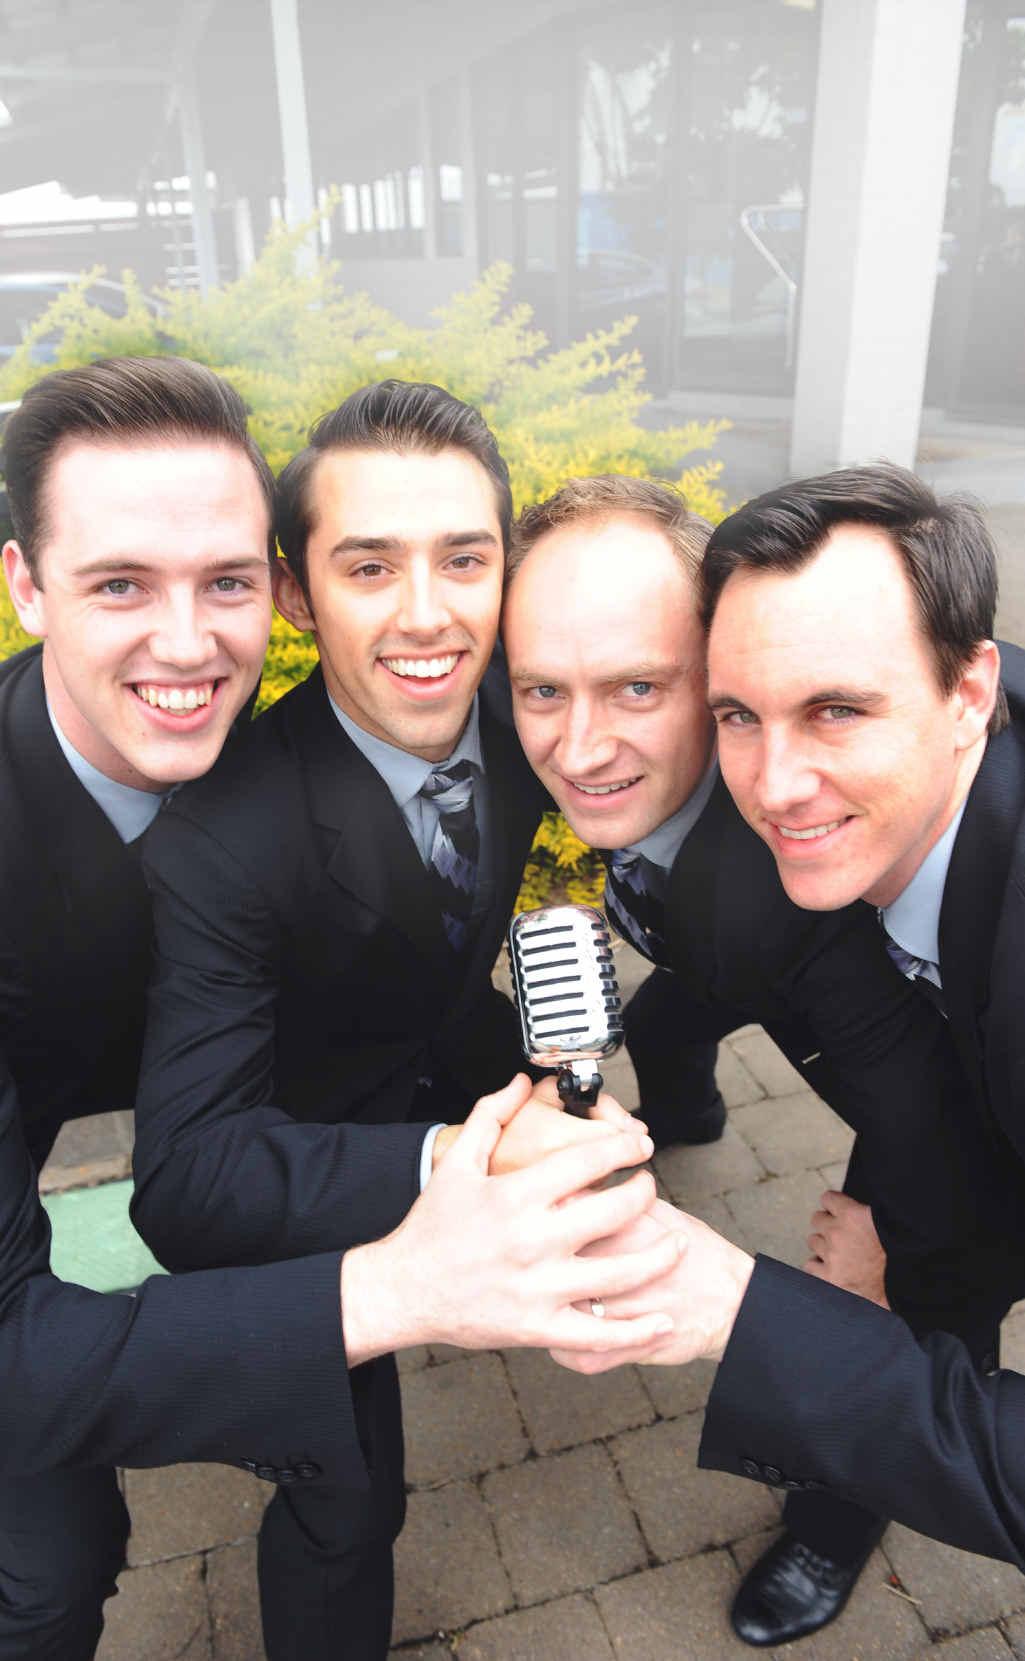 The Jersey Boys Declan Egan, Dion Bilios, Anthony Harkin and Glaston Toft visit Bundaberg on their regional tour.